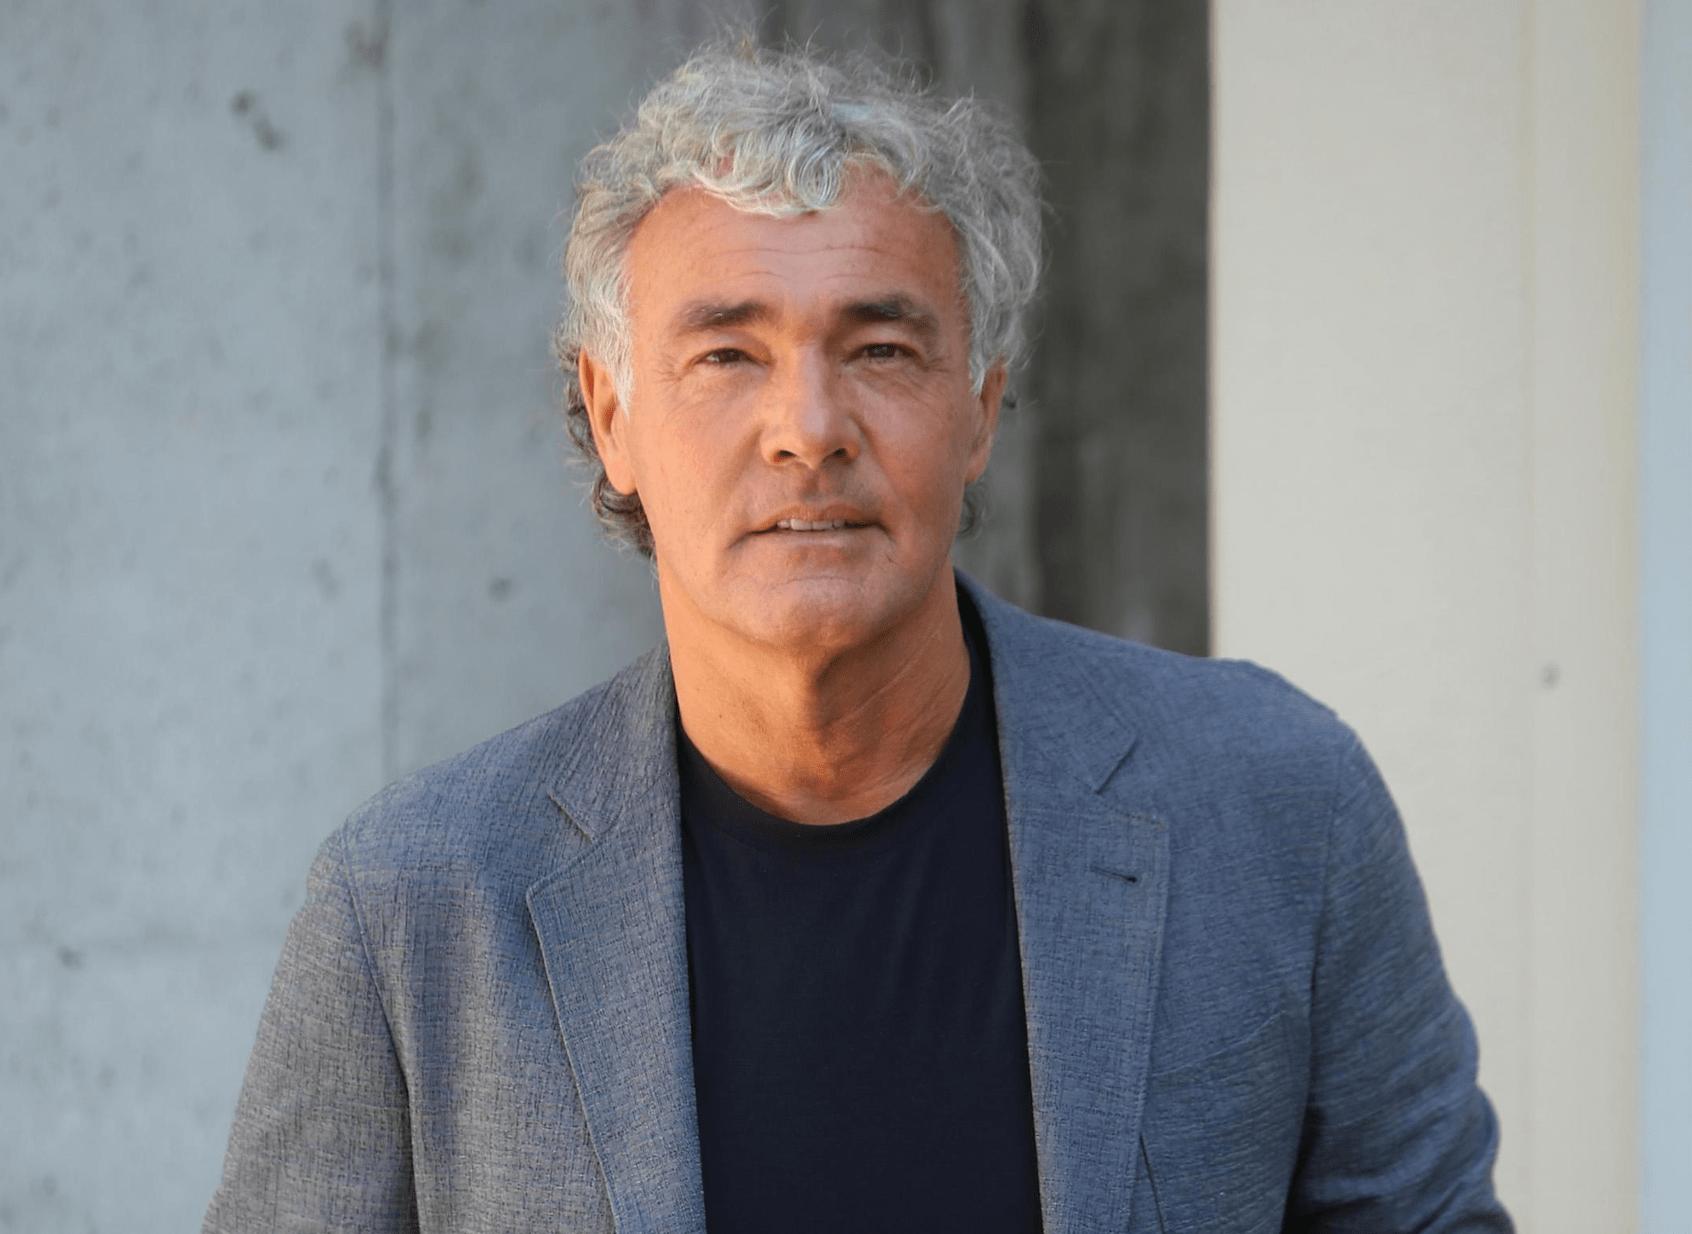 Massimo giletti lascia rai 1 l'arena a mediaset o la7